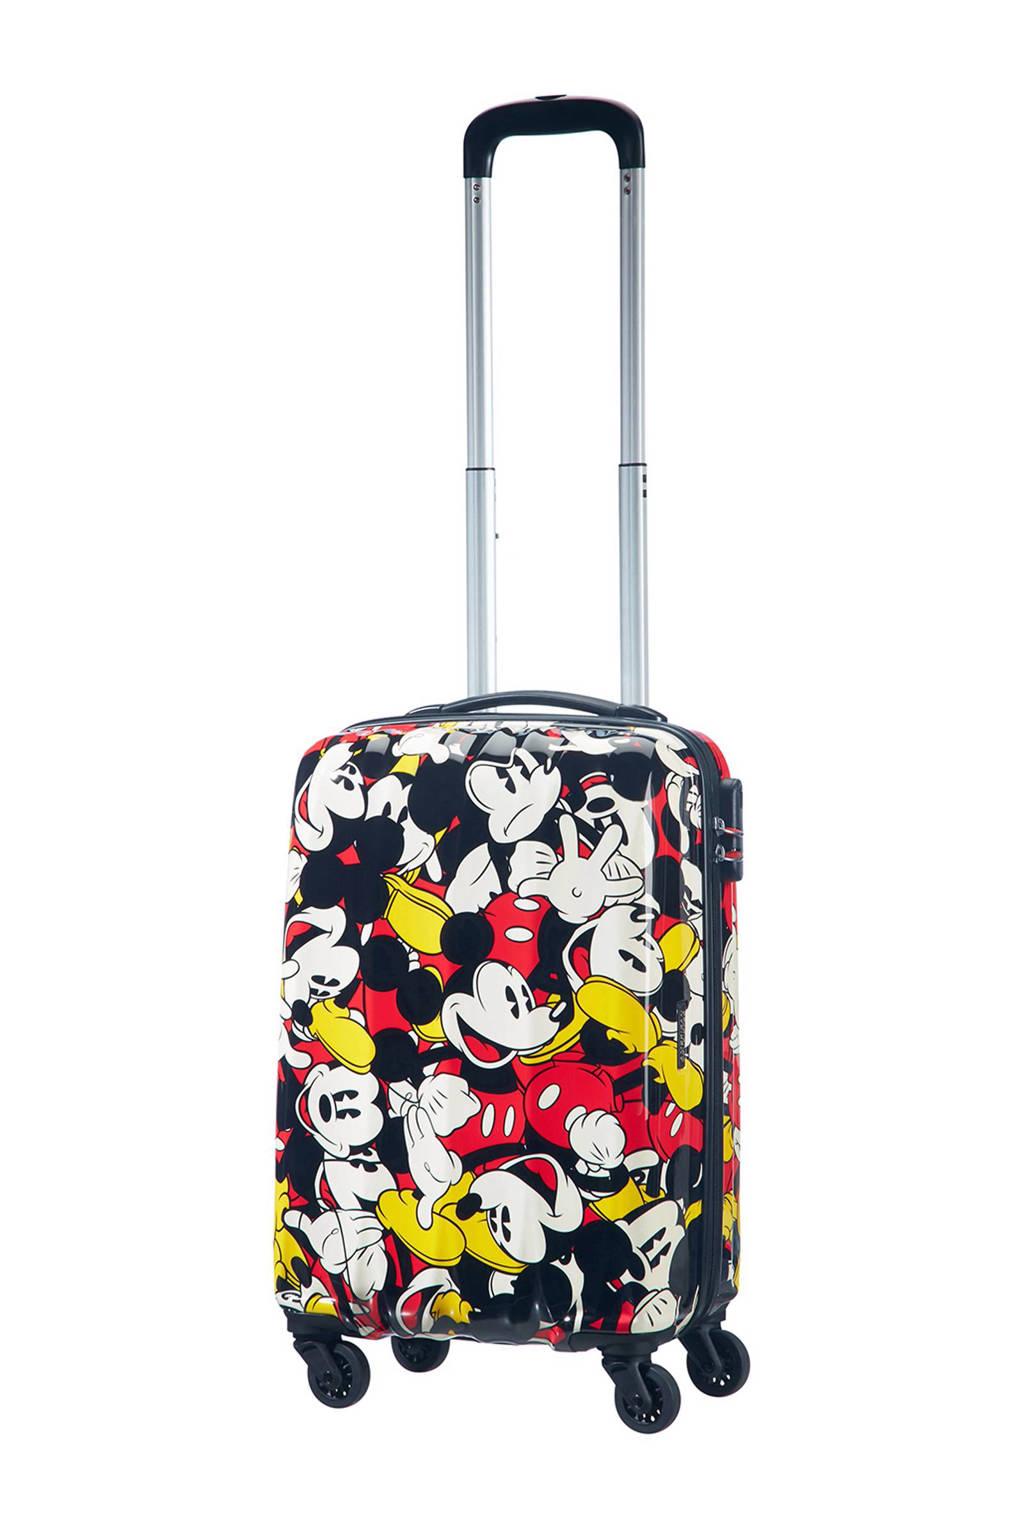 American Tourister Disney Legends koffer (55 cm), Zwart/rood/wit/geel